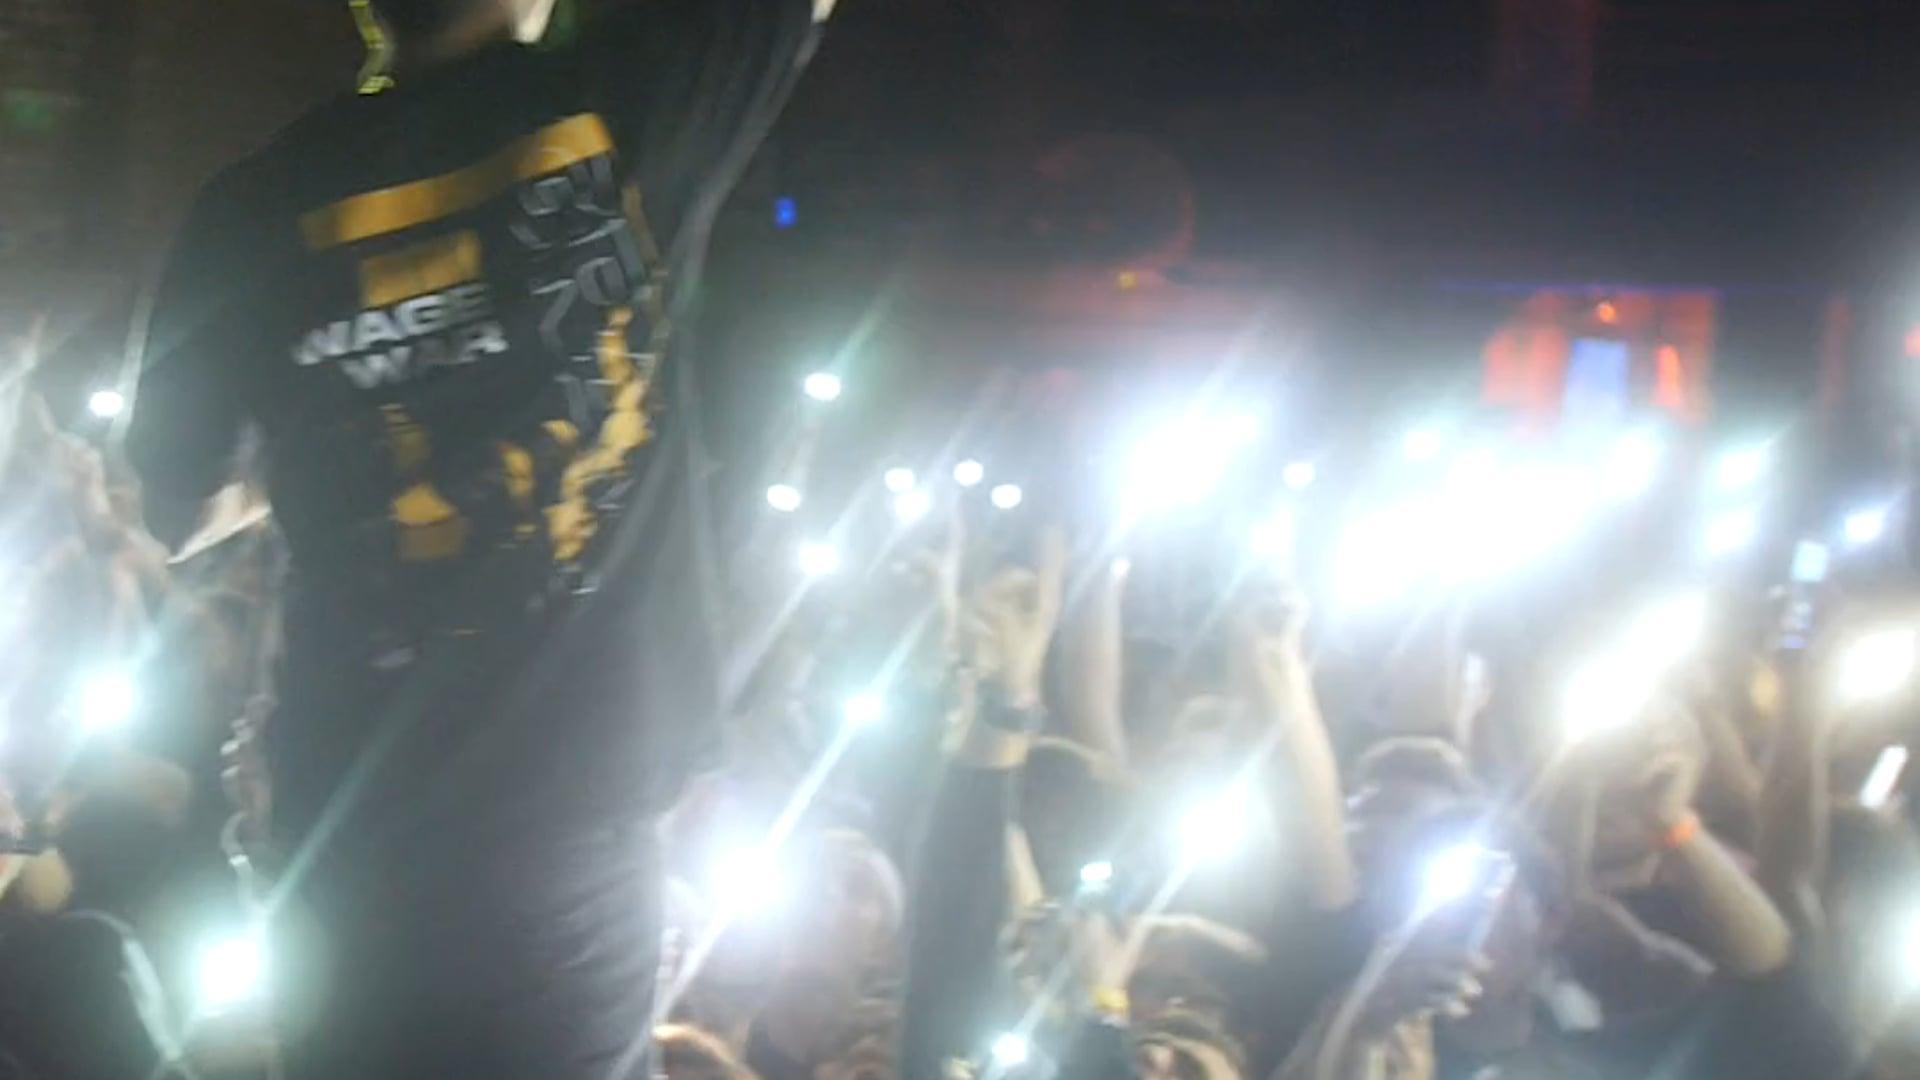 Josh A + Jake Hill - Save Our Souls Tour: Chicago Recap